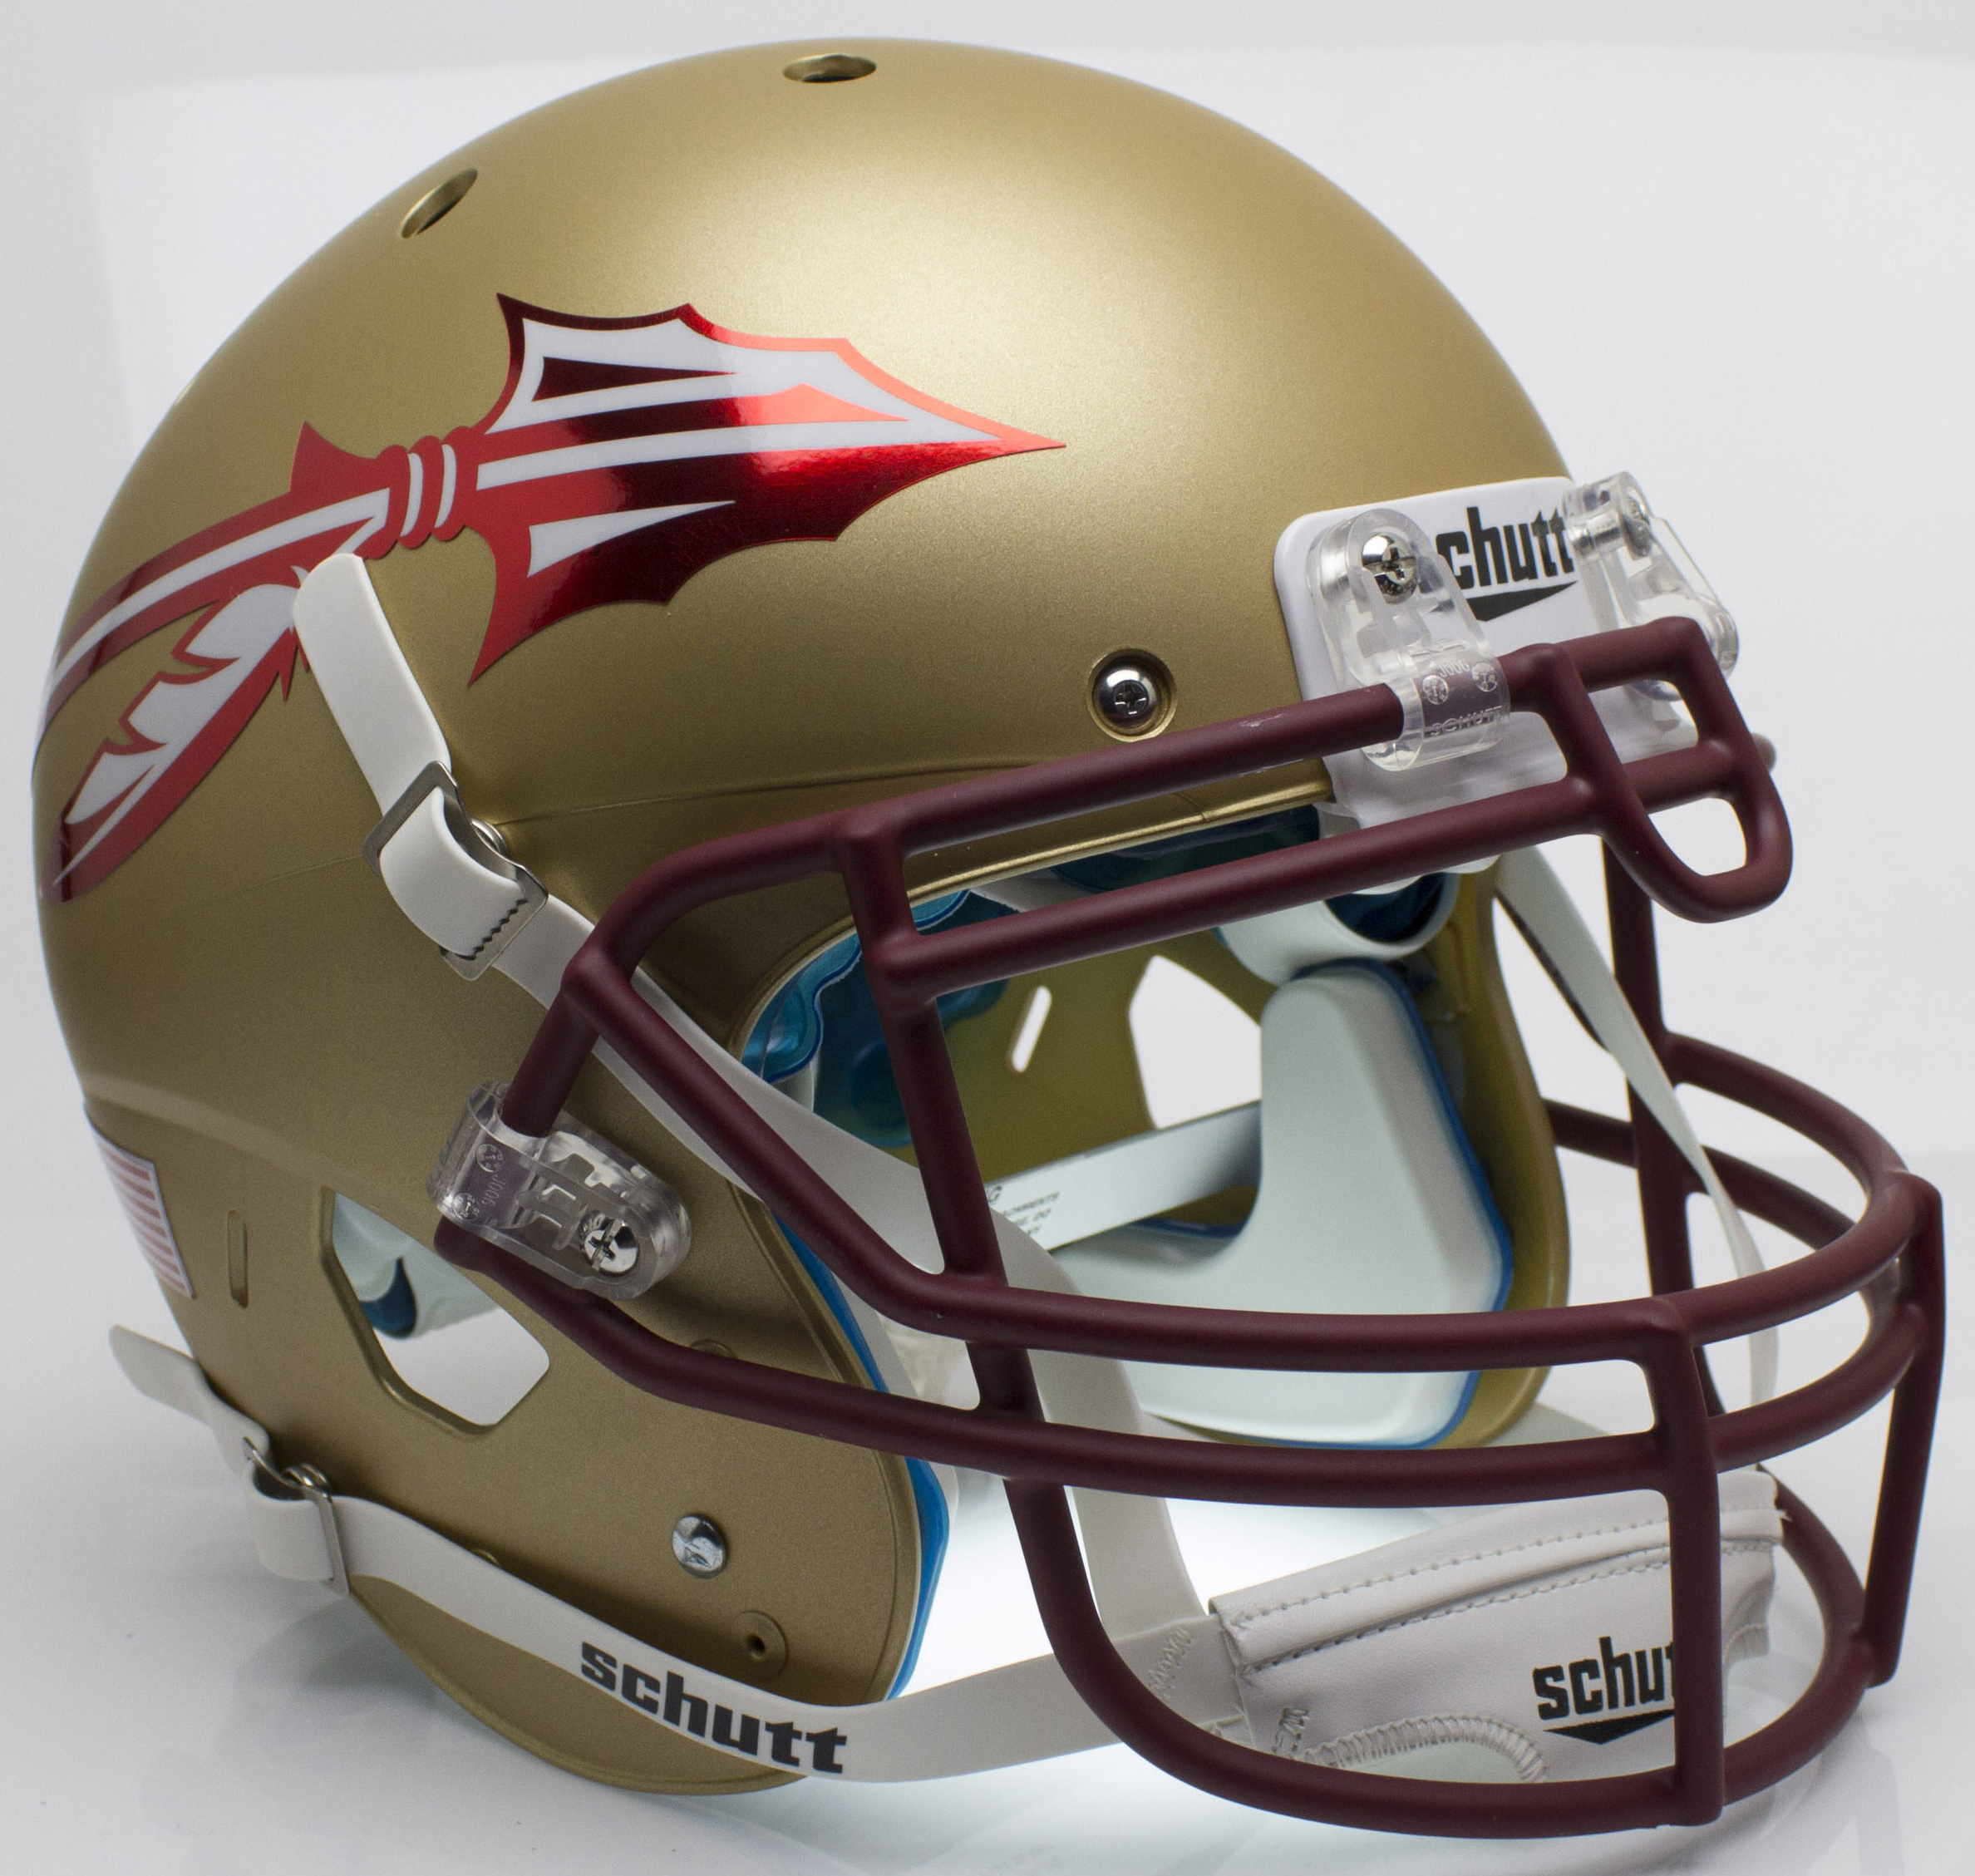 Florida State Seminoles Authentic College XP Football Helmet Schutt <B>Alt 2</B>